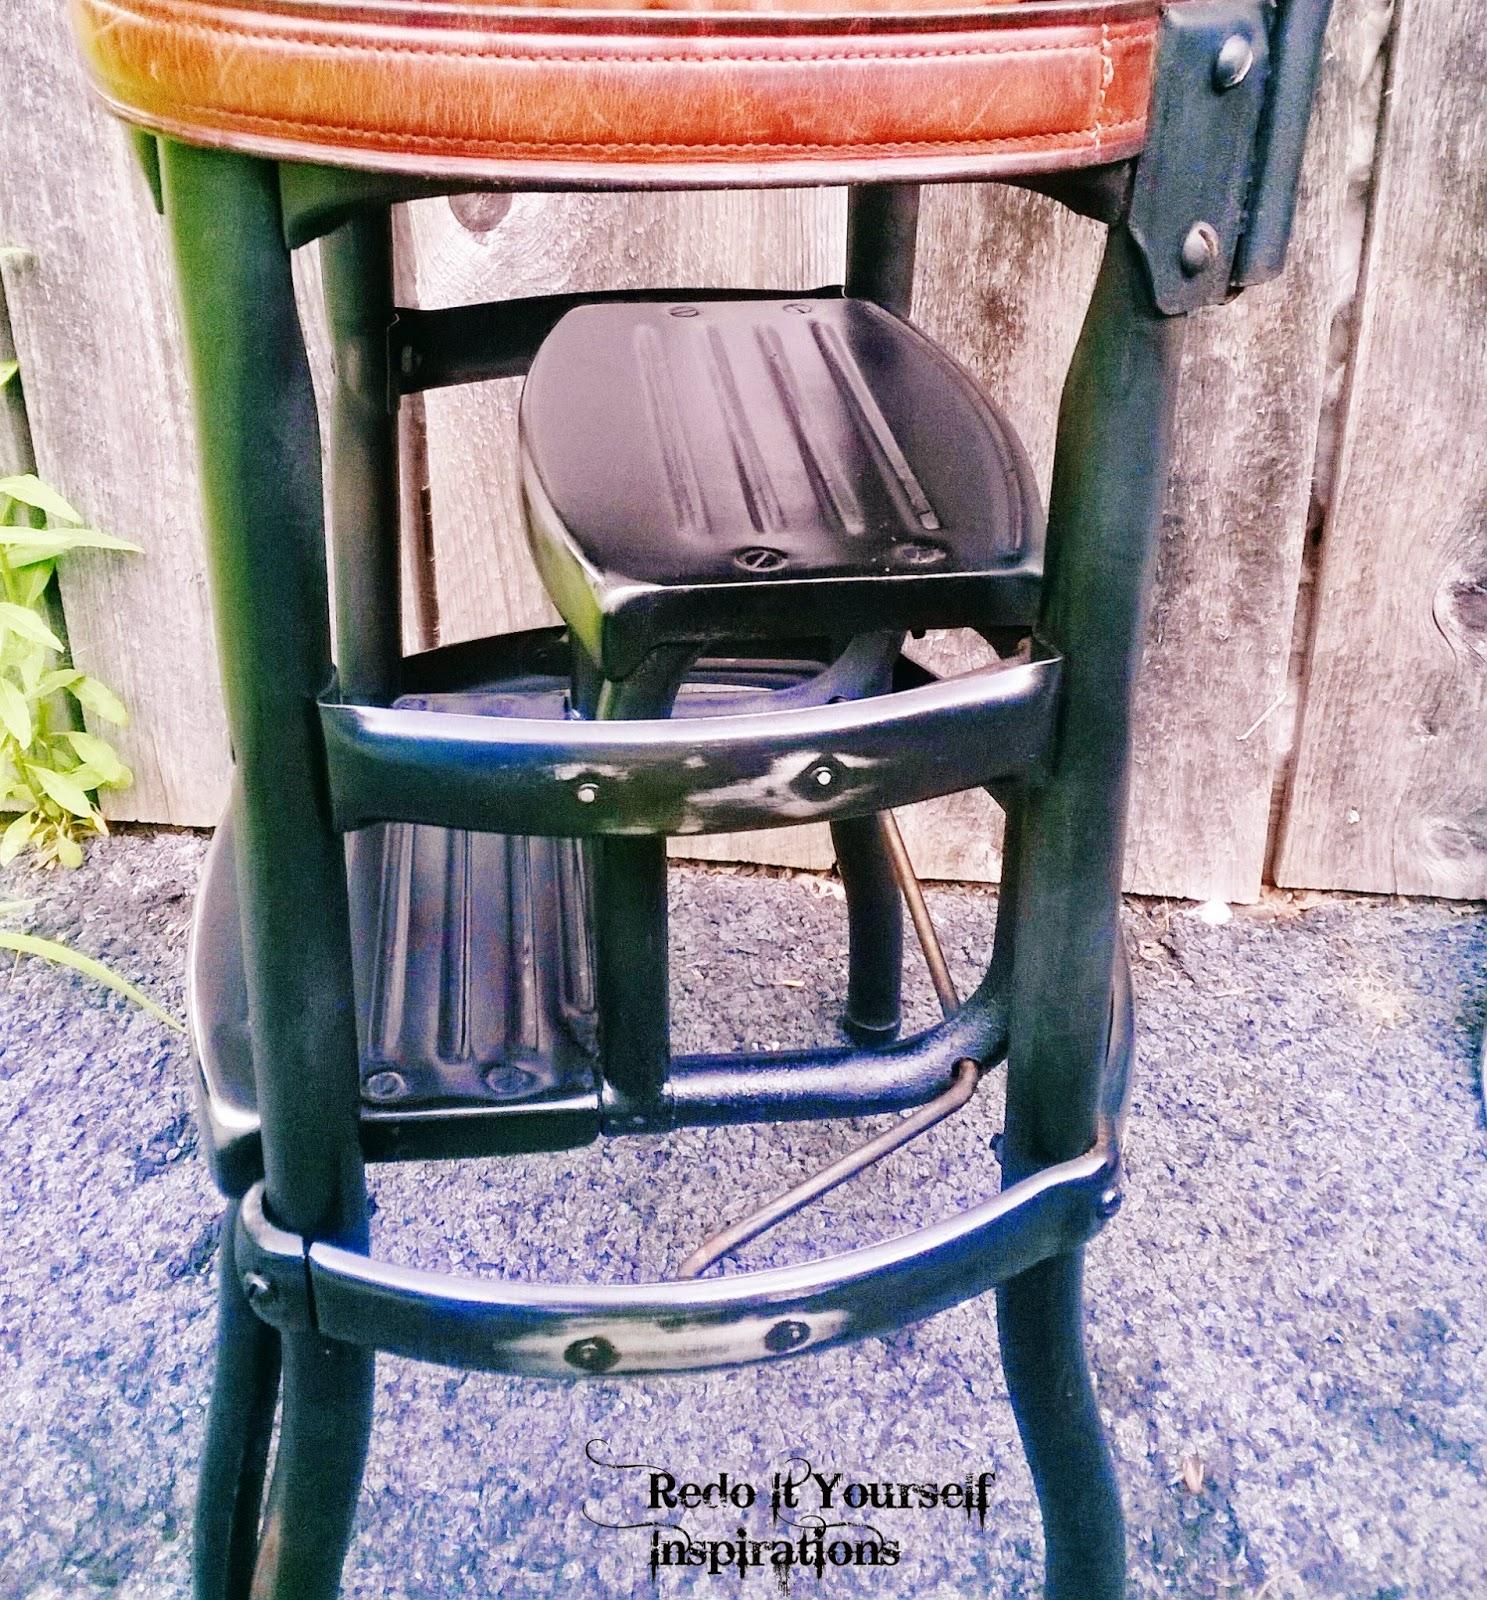 Pleasant Junk Yard Step Chair Redo 11 Knockoff Redo It Yourself Dailytribune Chair Design For Home Dailytribuneorg